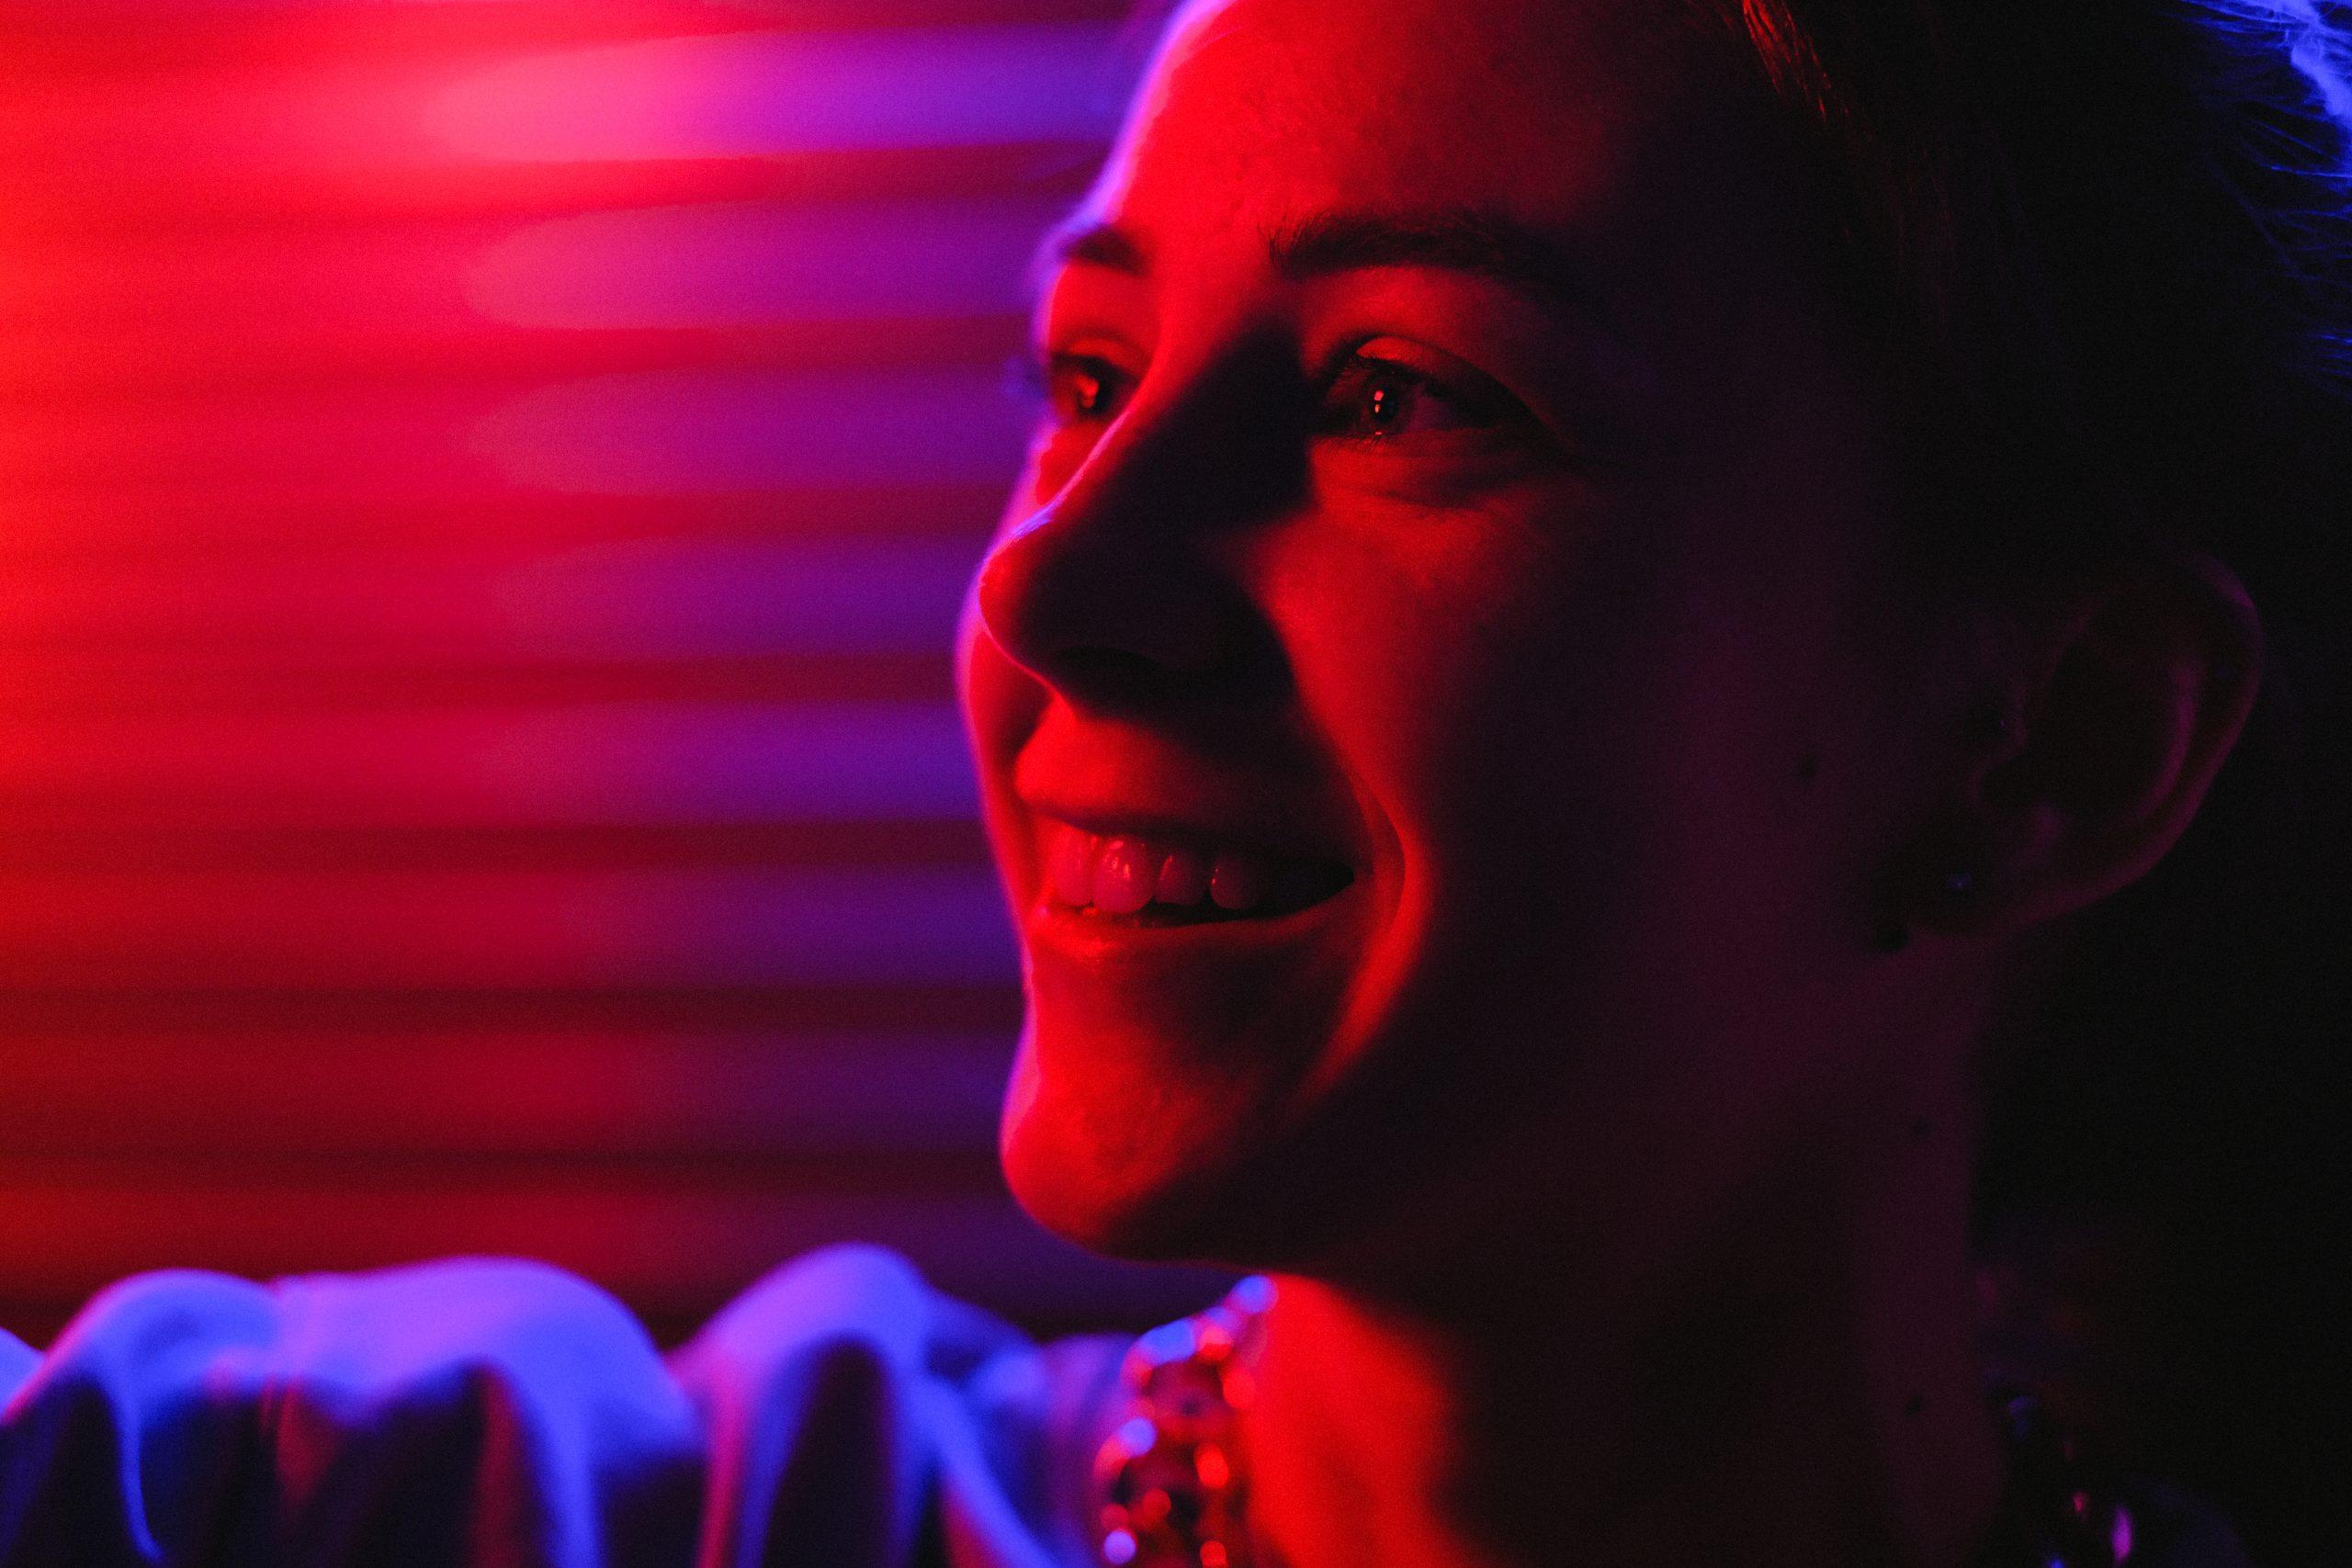 Light people woman festival